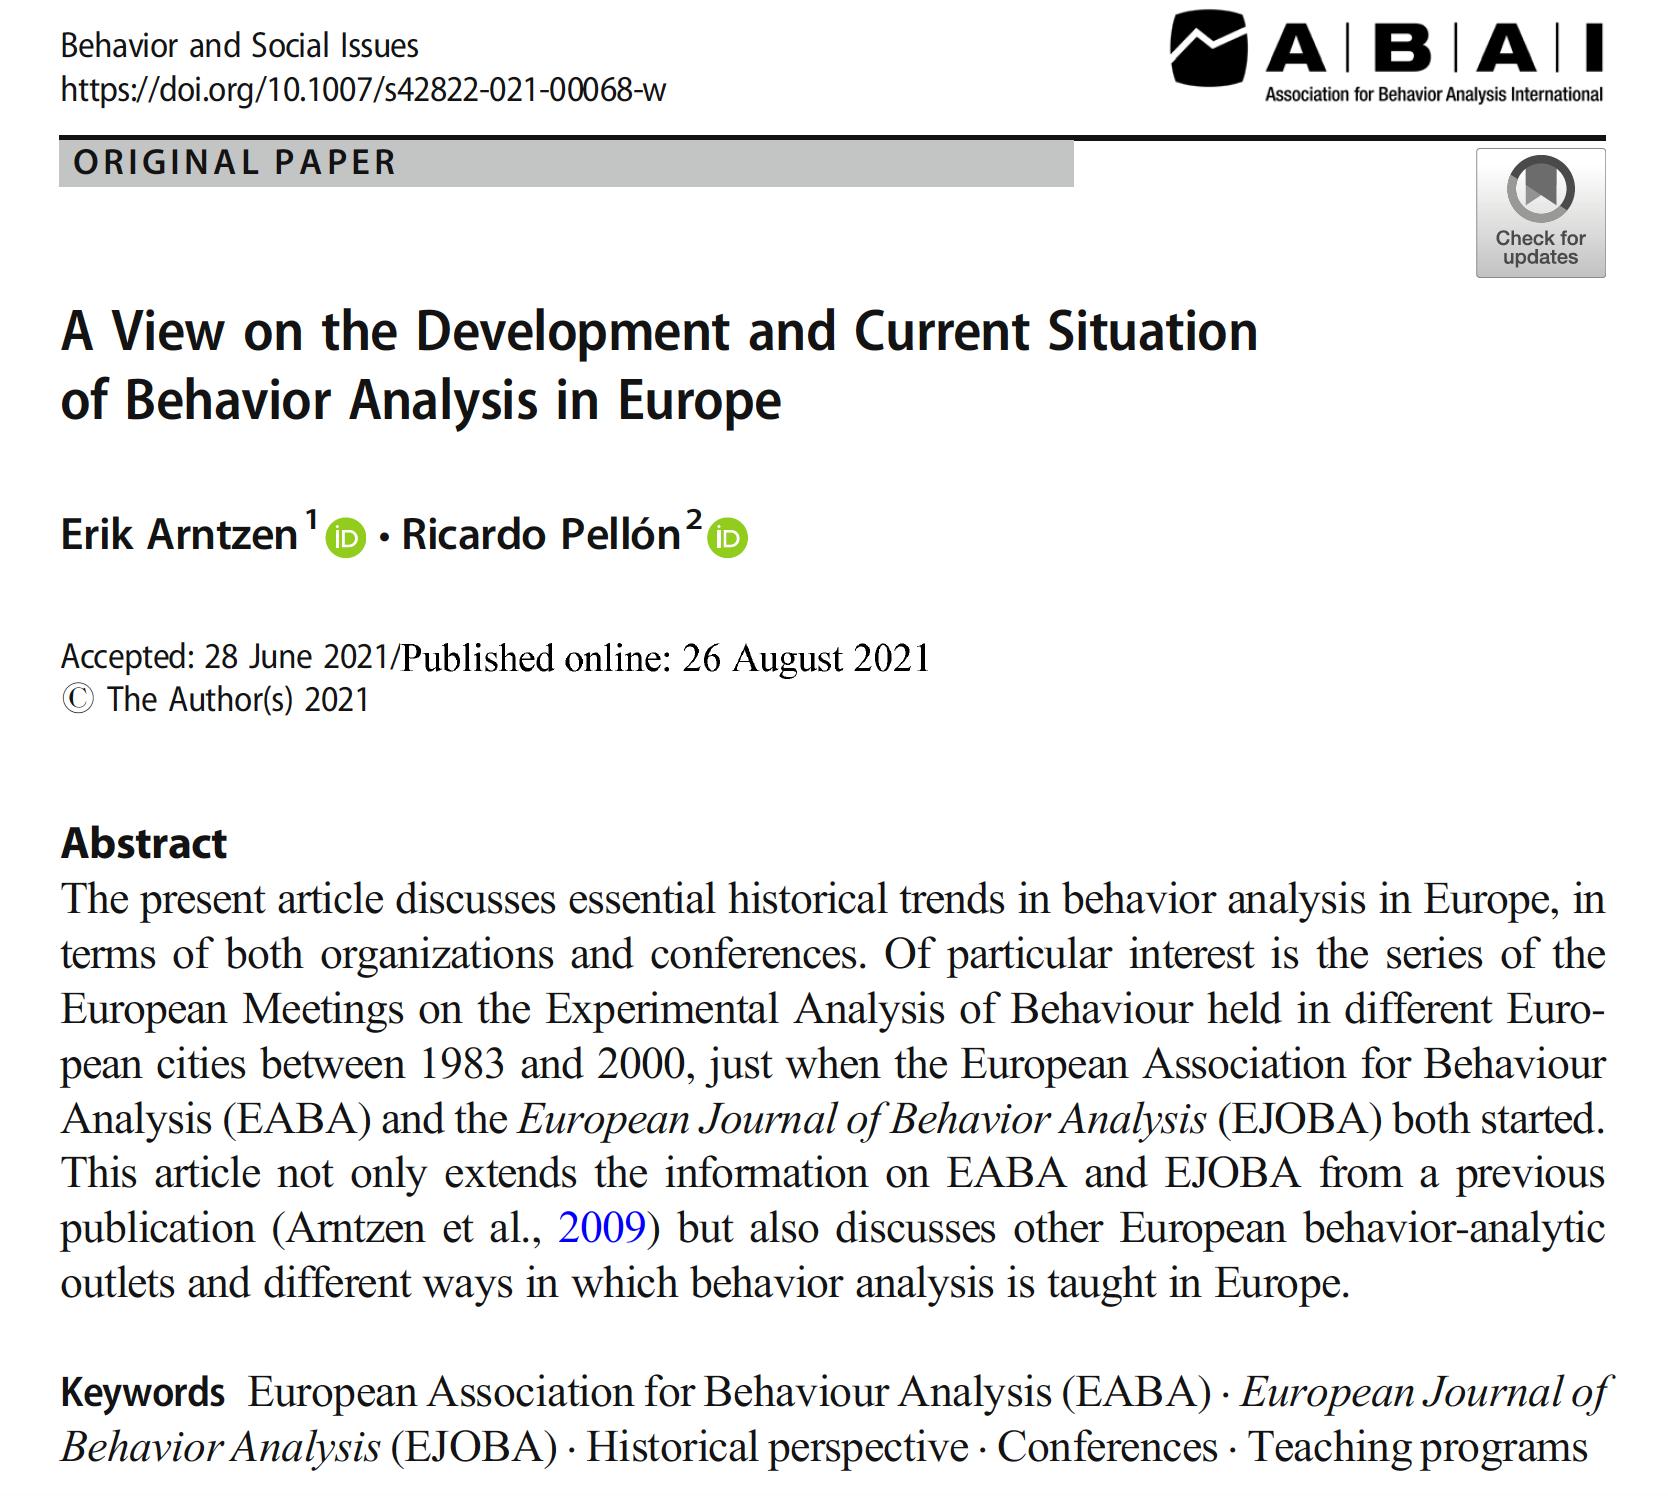 Paper on behavior analysis in Europe